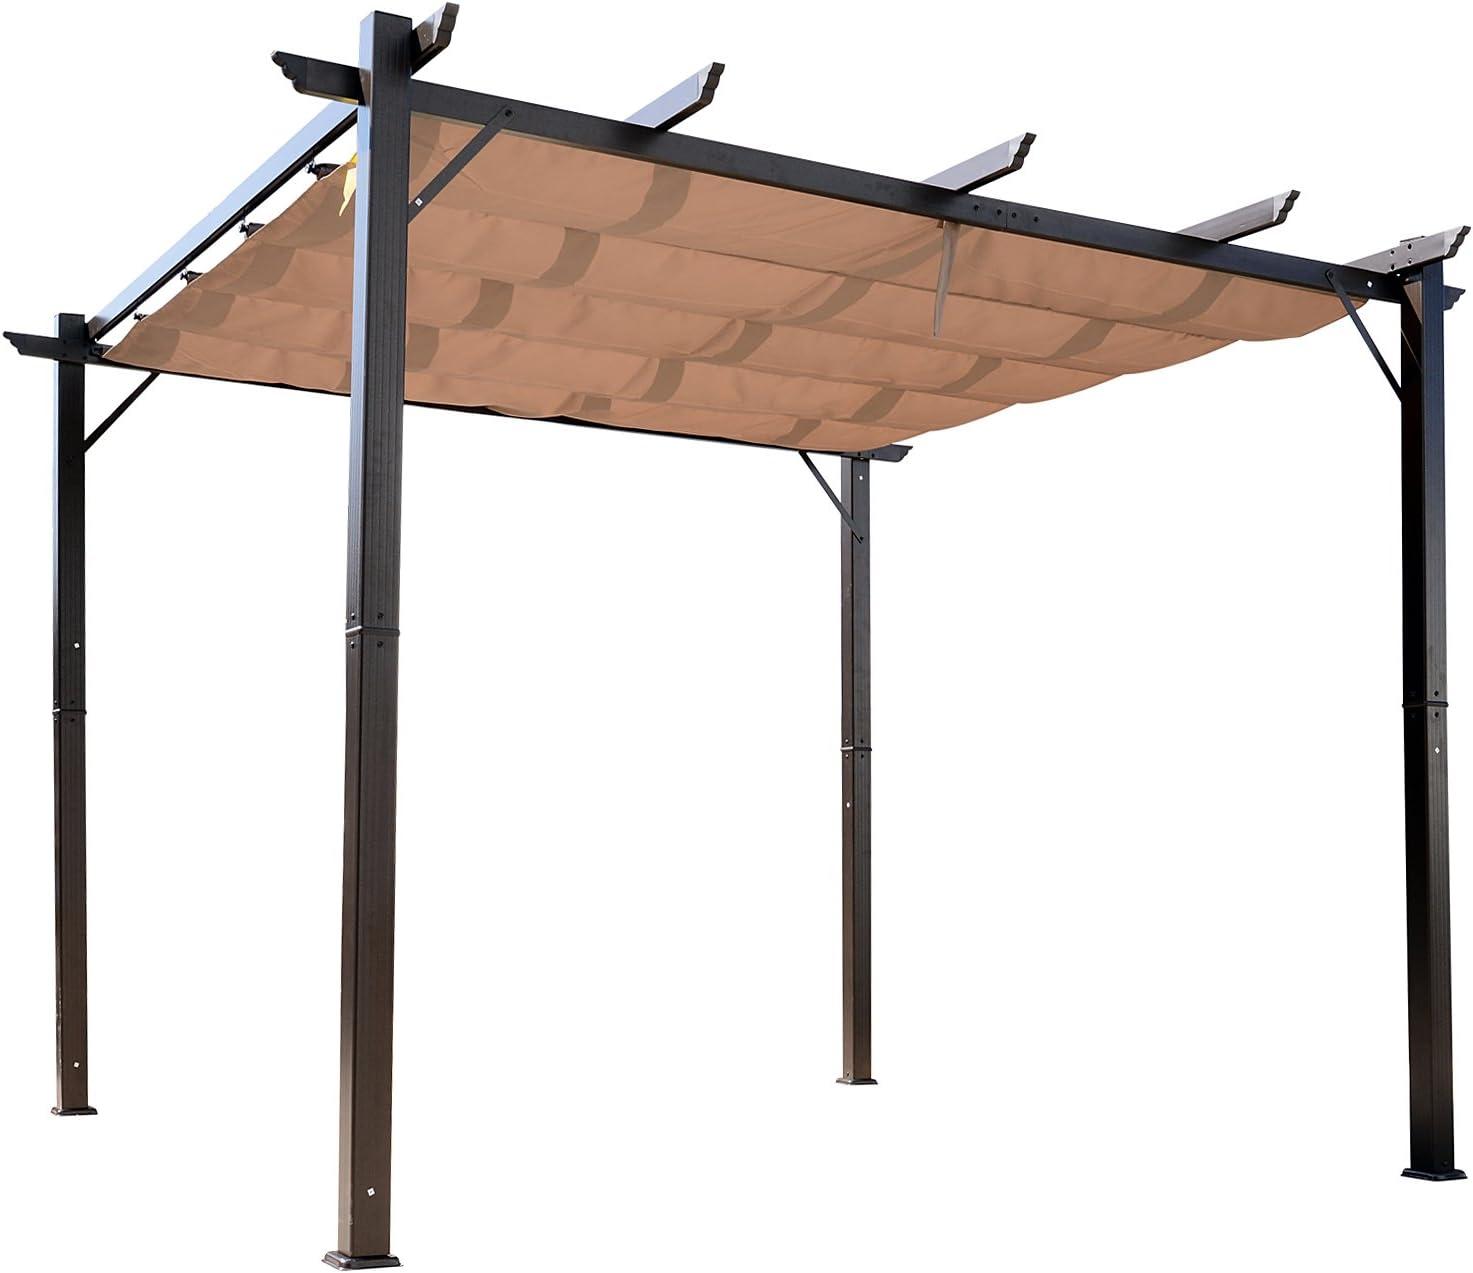 Amazon Com Outsunny 10 X 10 Aluminum Retractable Patio Gazebo Garden Pergola With Weather Resistant Canopy And Stylish Design Garden Outdoor